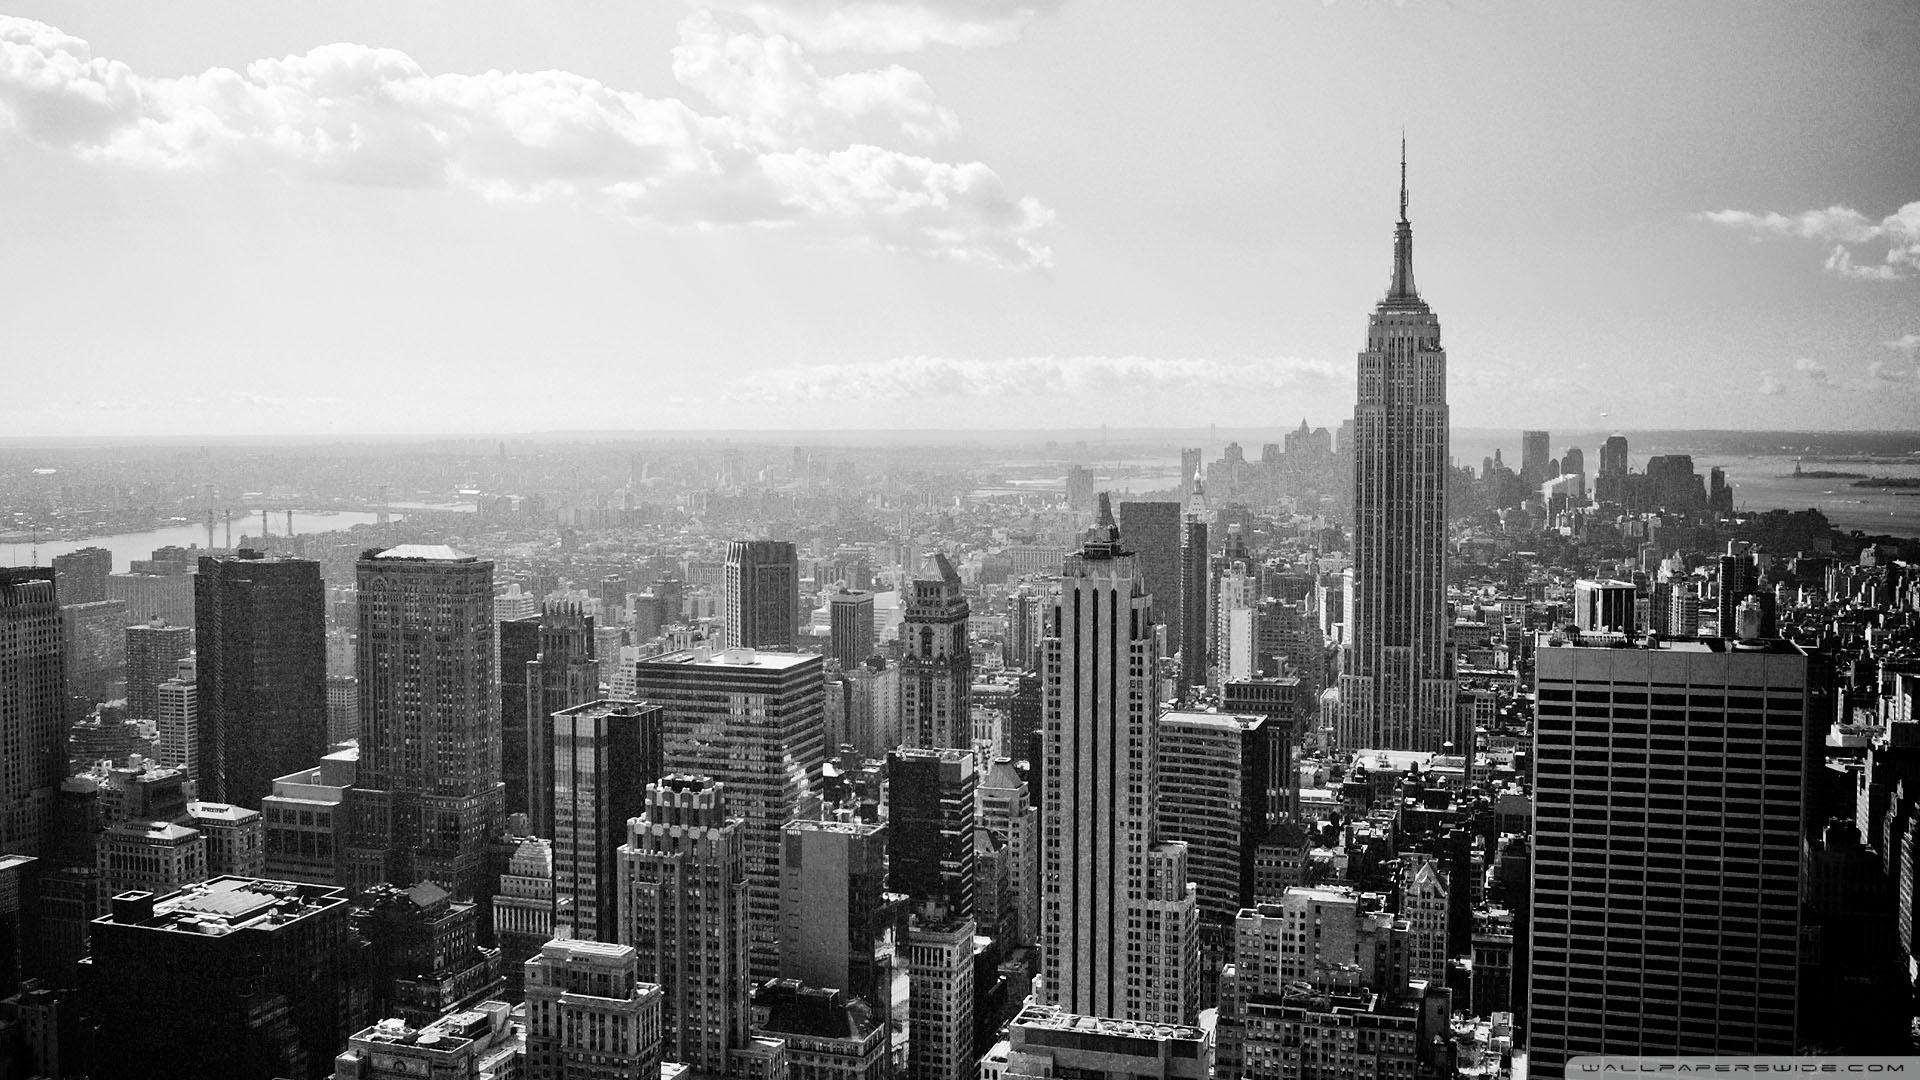 New York City Wallpaper 1920x1080 2368